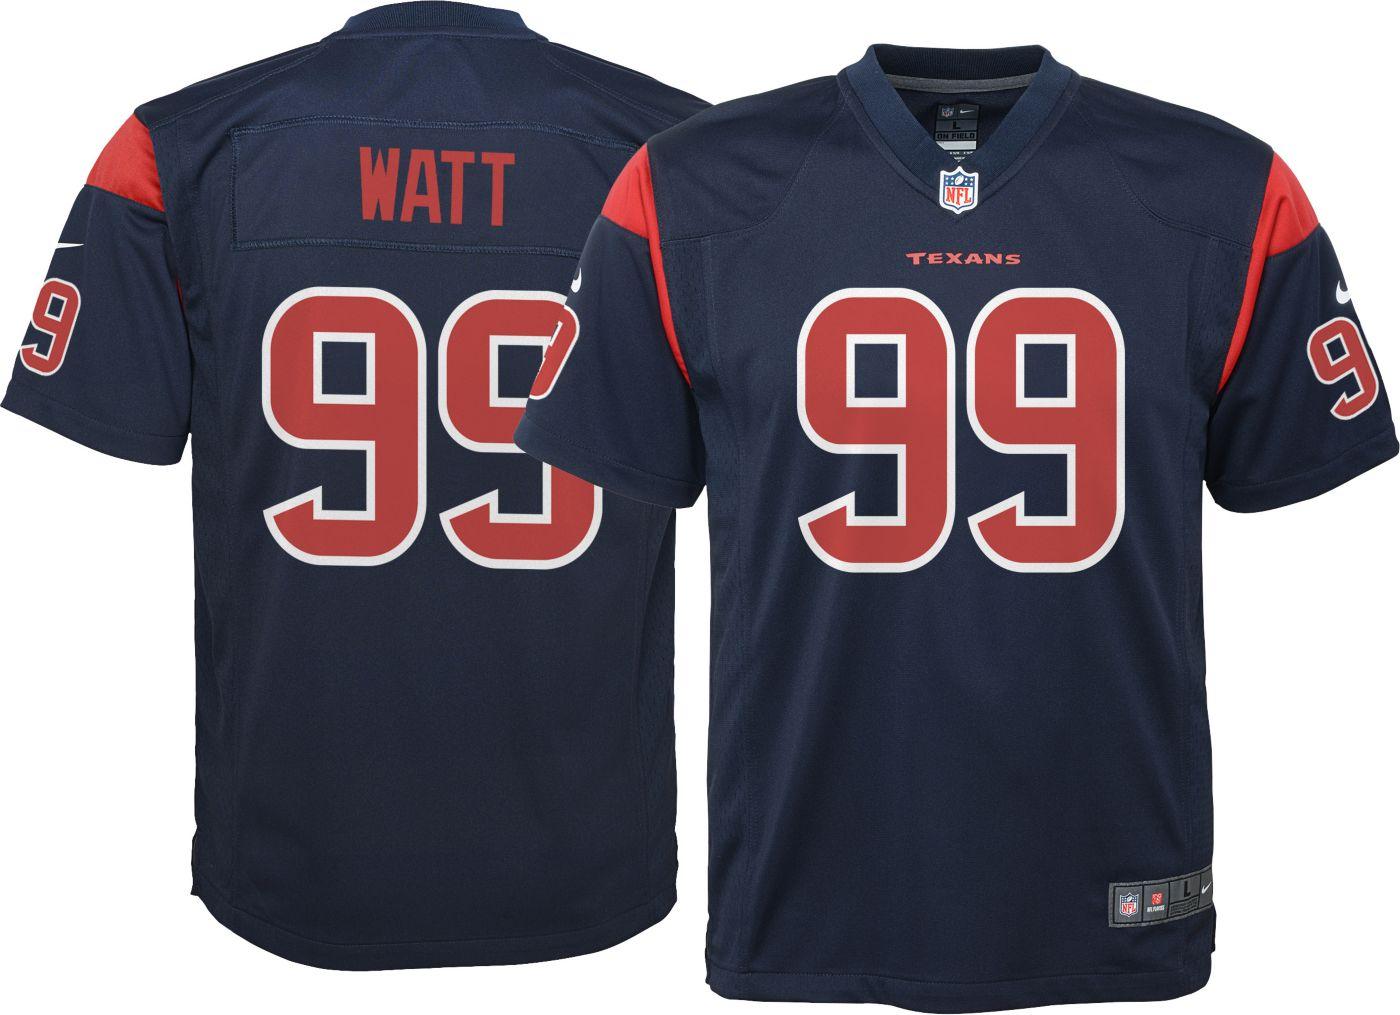 Nike Youth Color Rush Game Jersey Houston Texans J.J. Watt #99